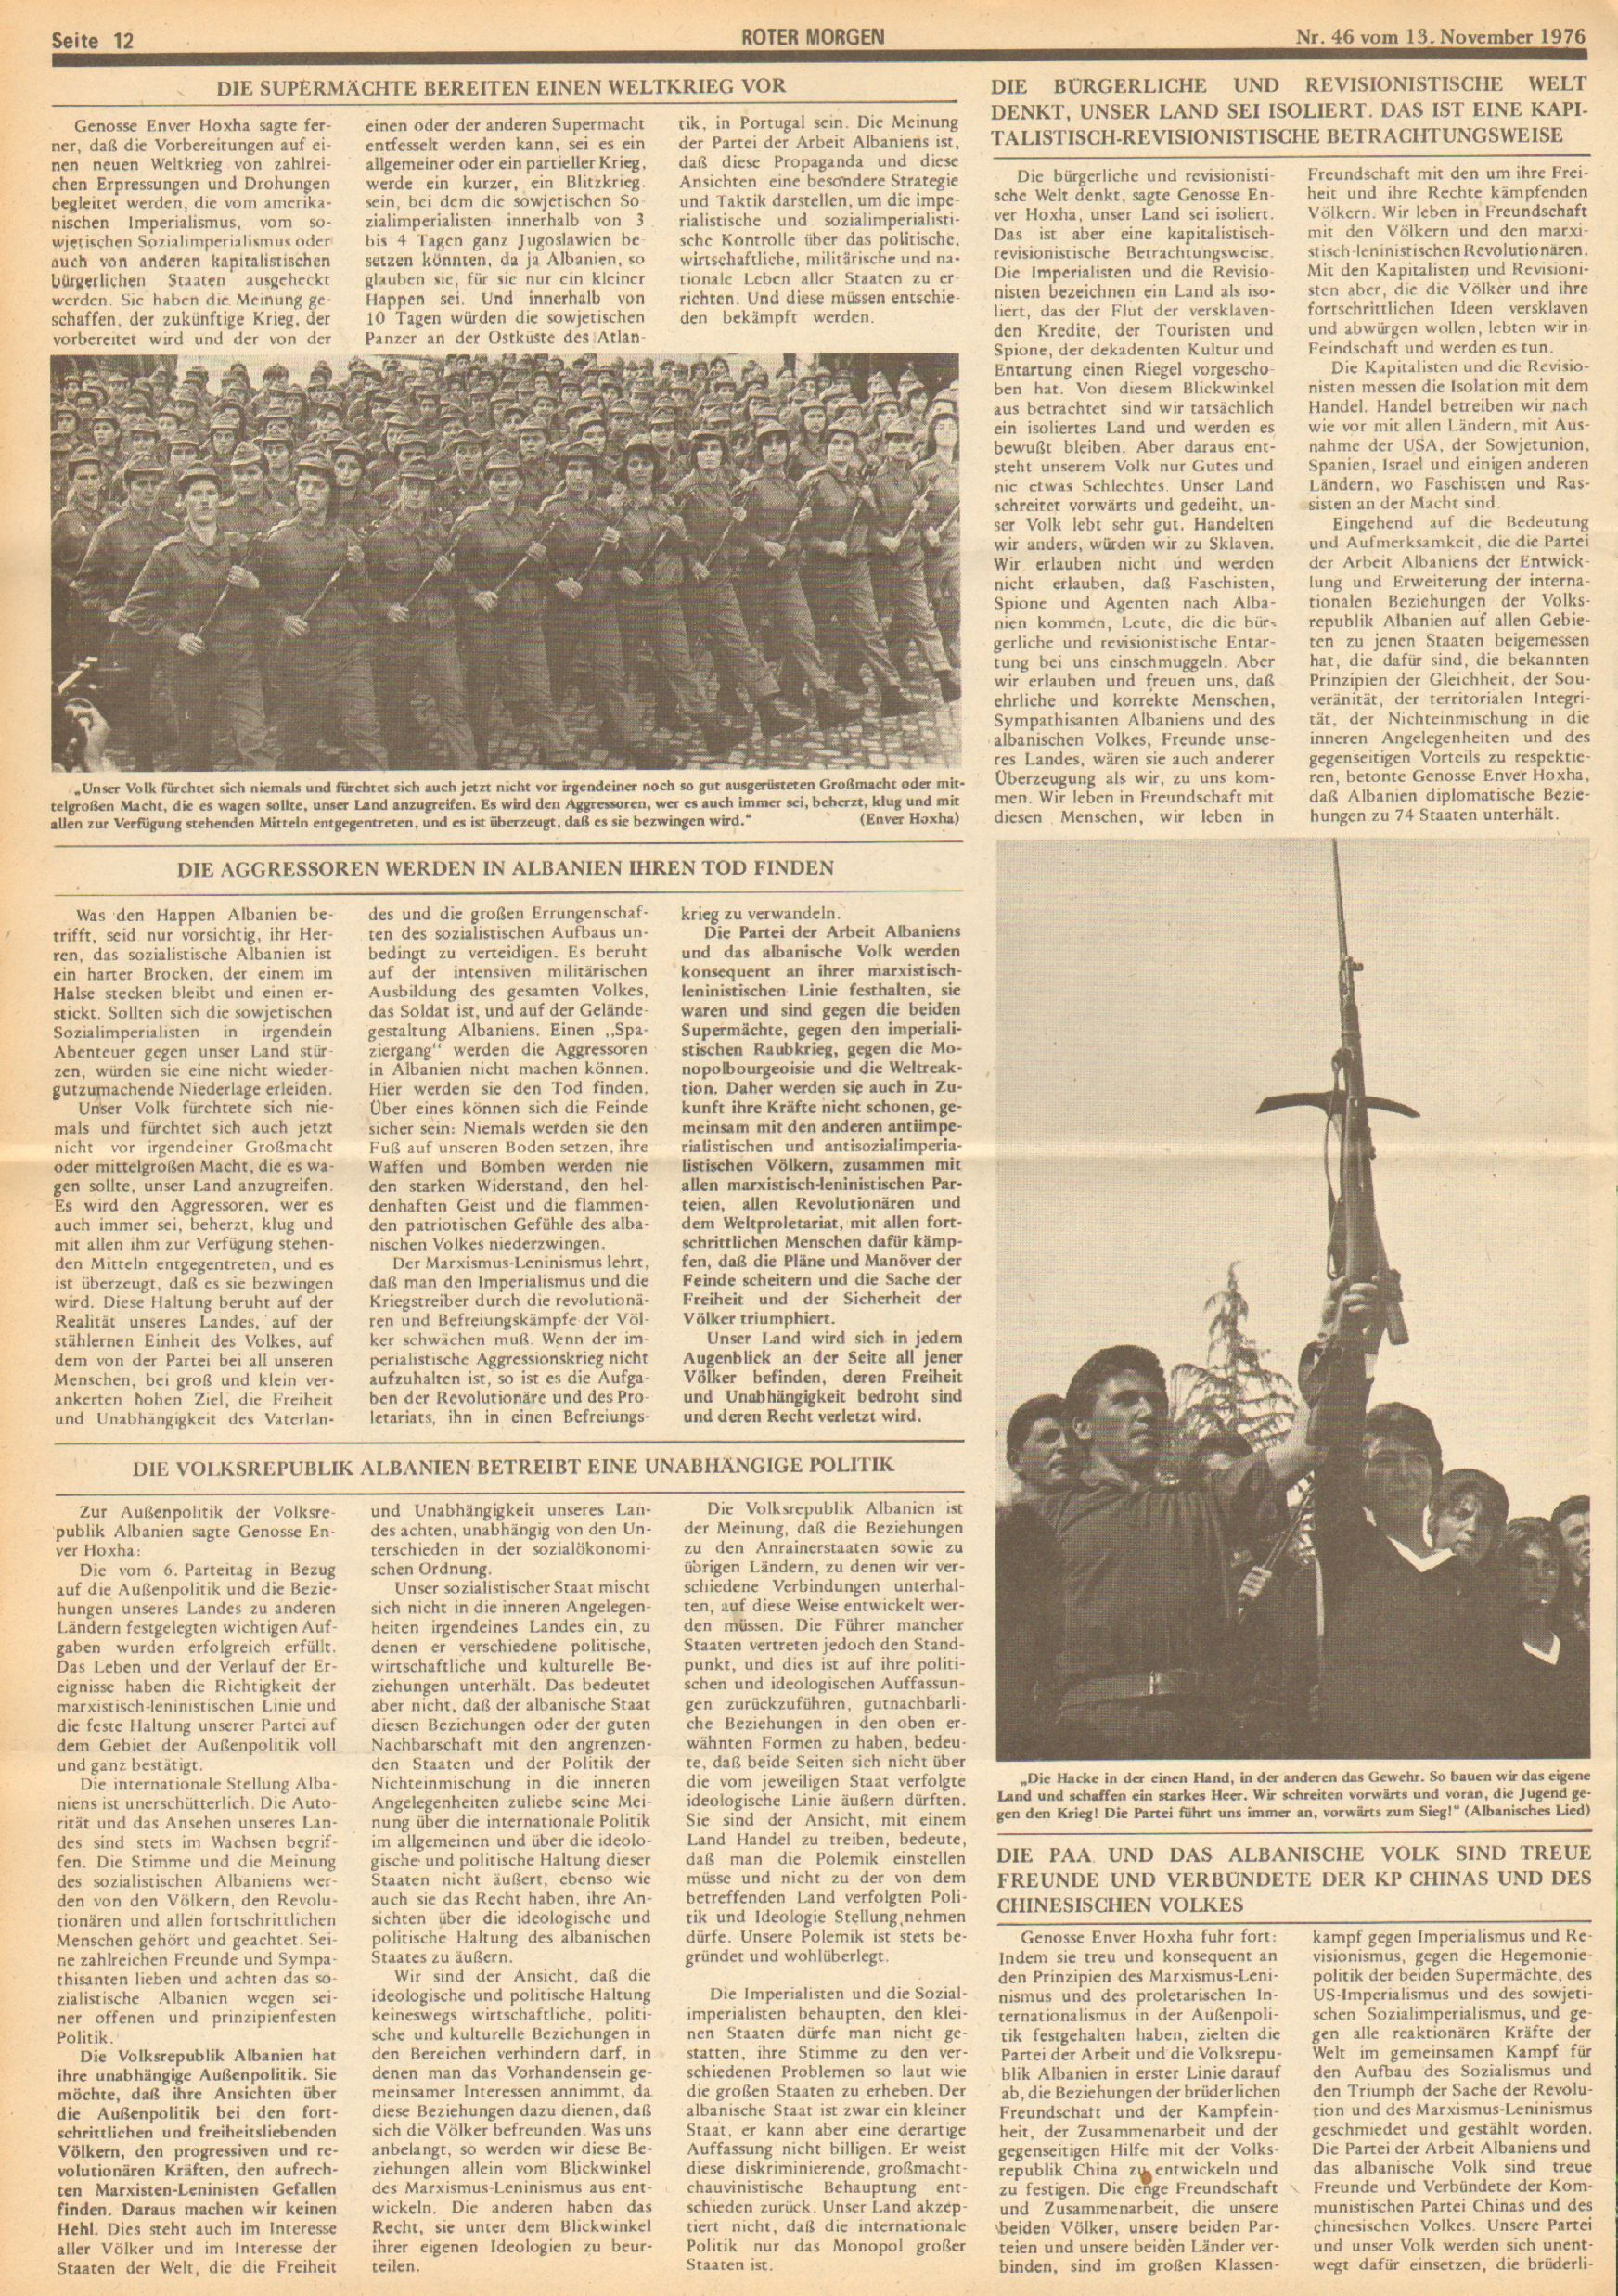 Roter Morgen, 10. Jg., 13. November 1976, Nr. 46, Seite 12